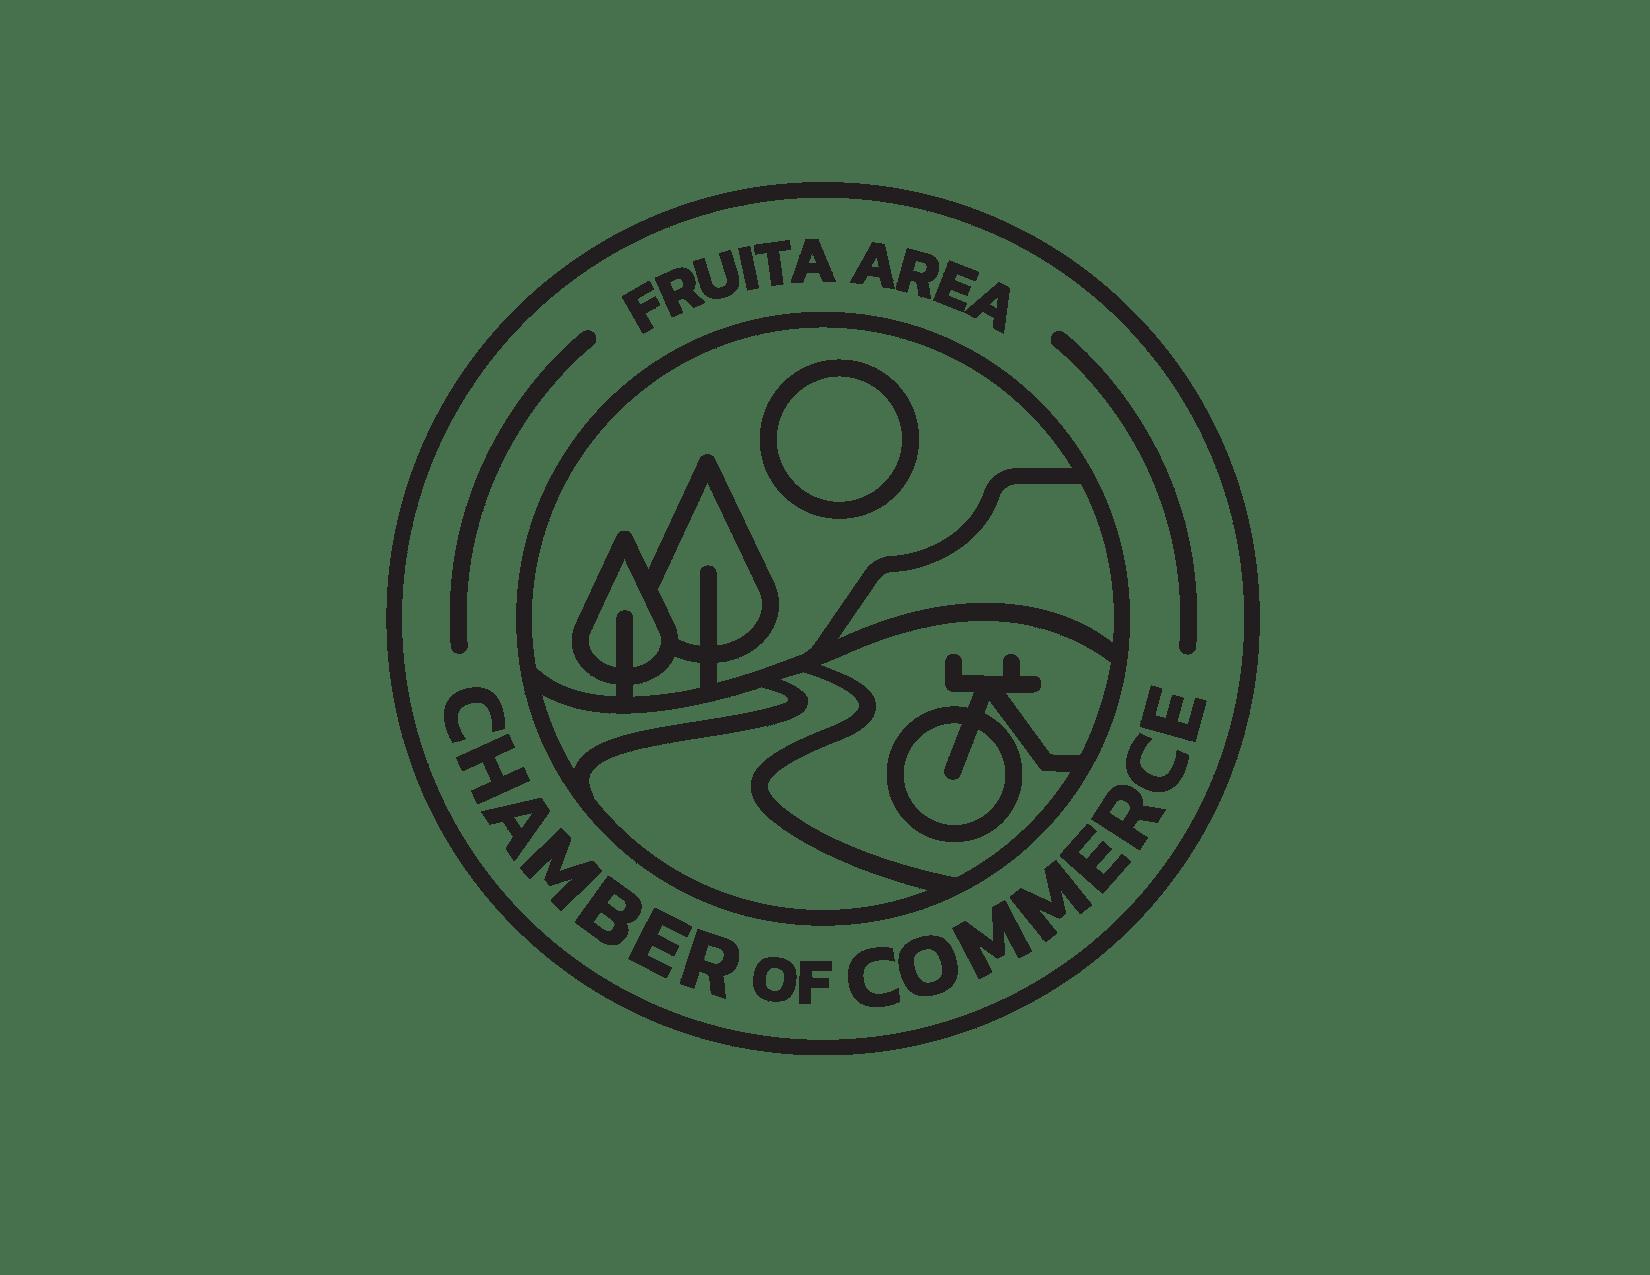 Fruita Area Chamber of Commerce